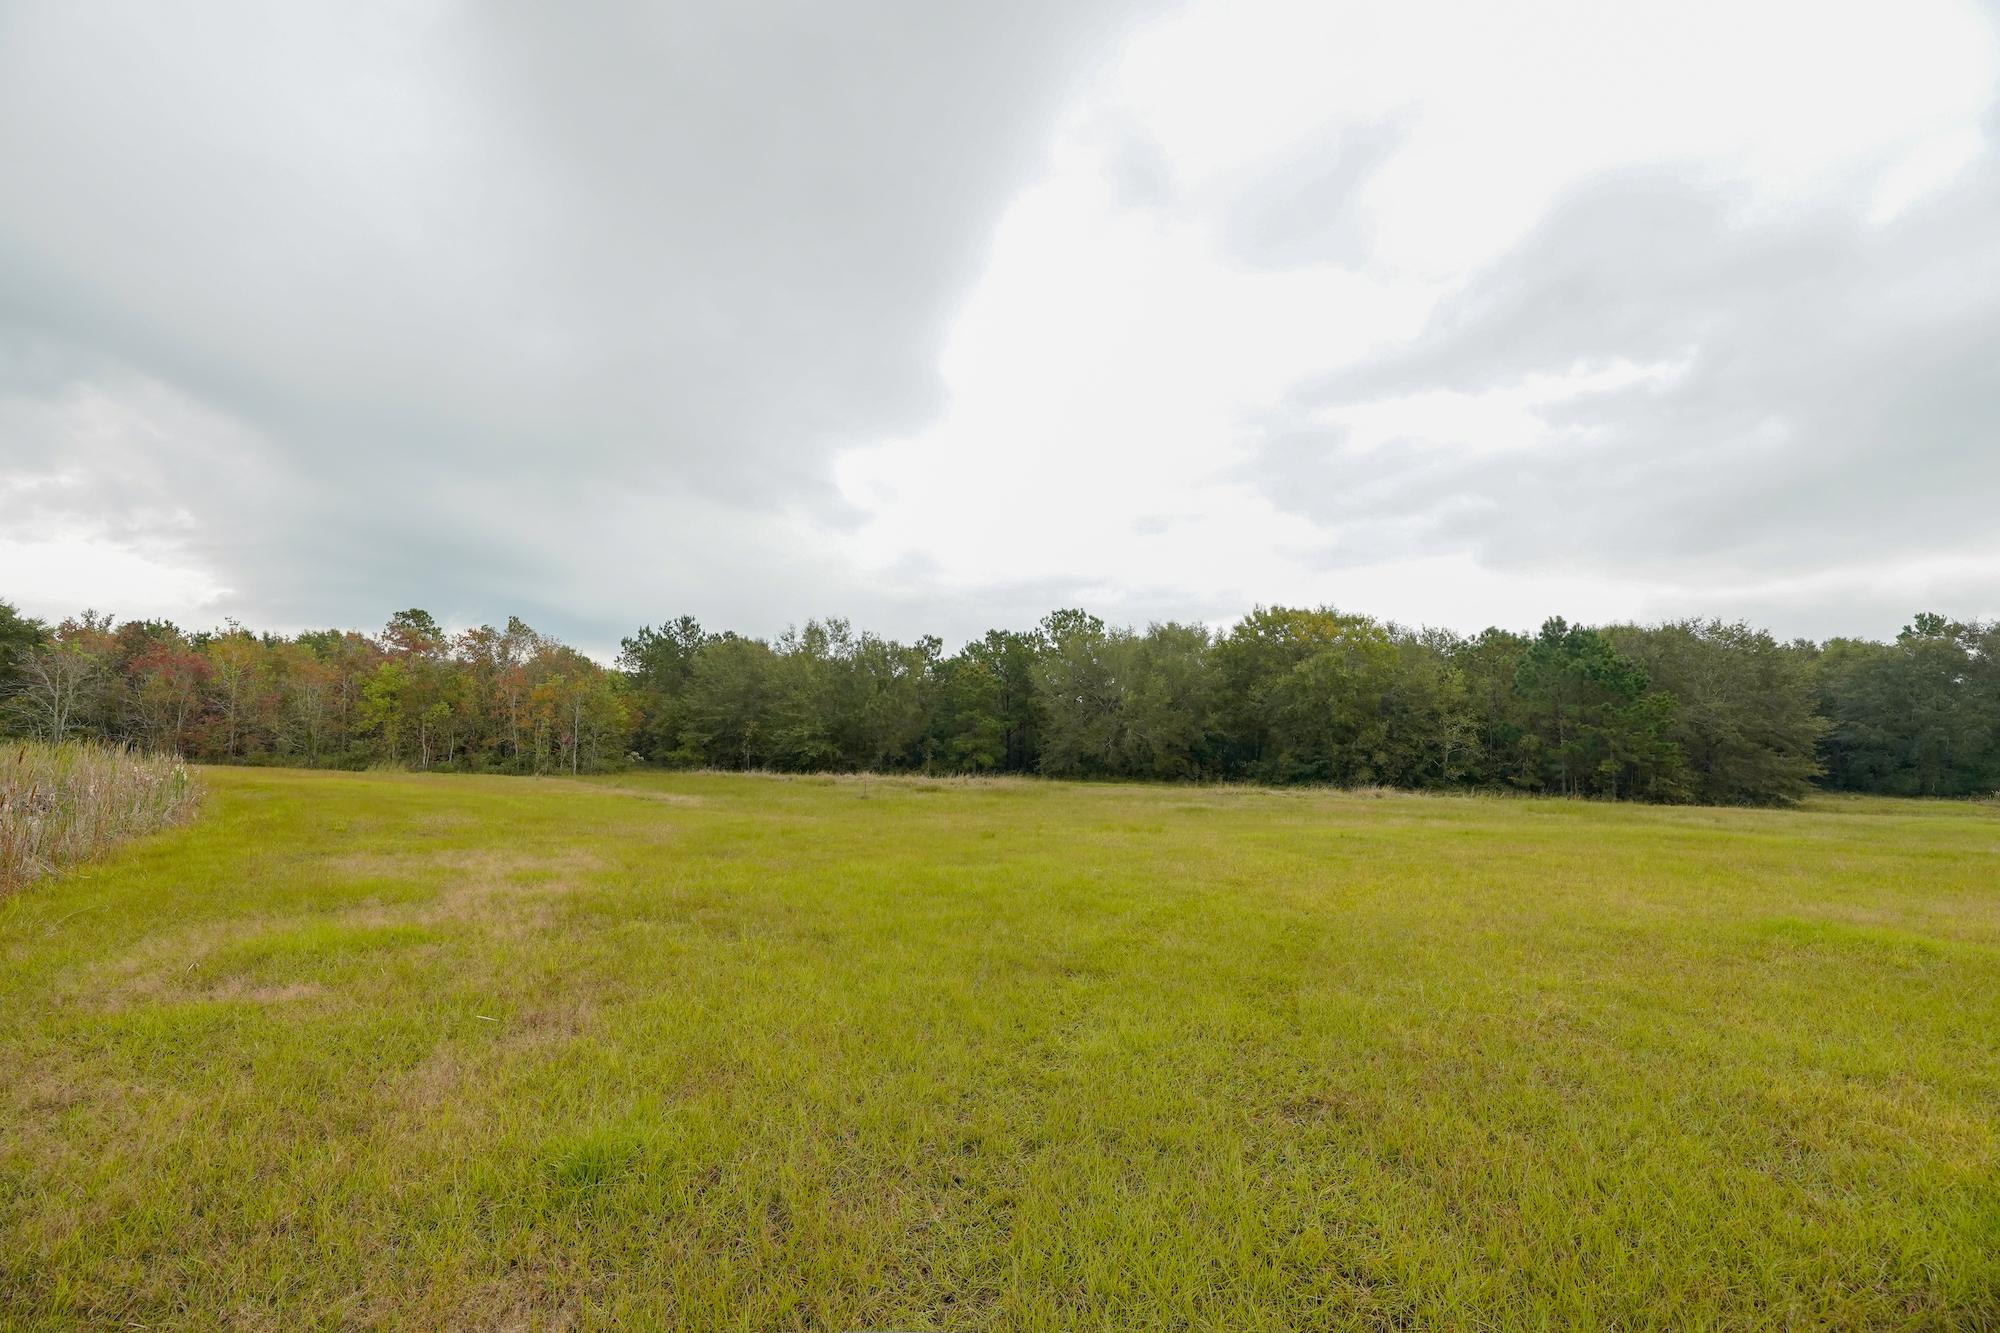 Jefferson County Development Land - Image 19 of 36